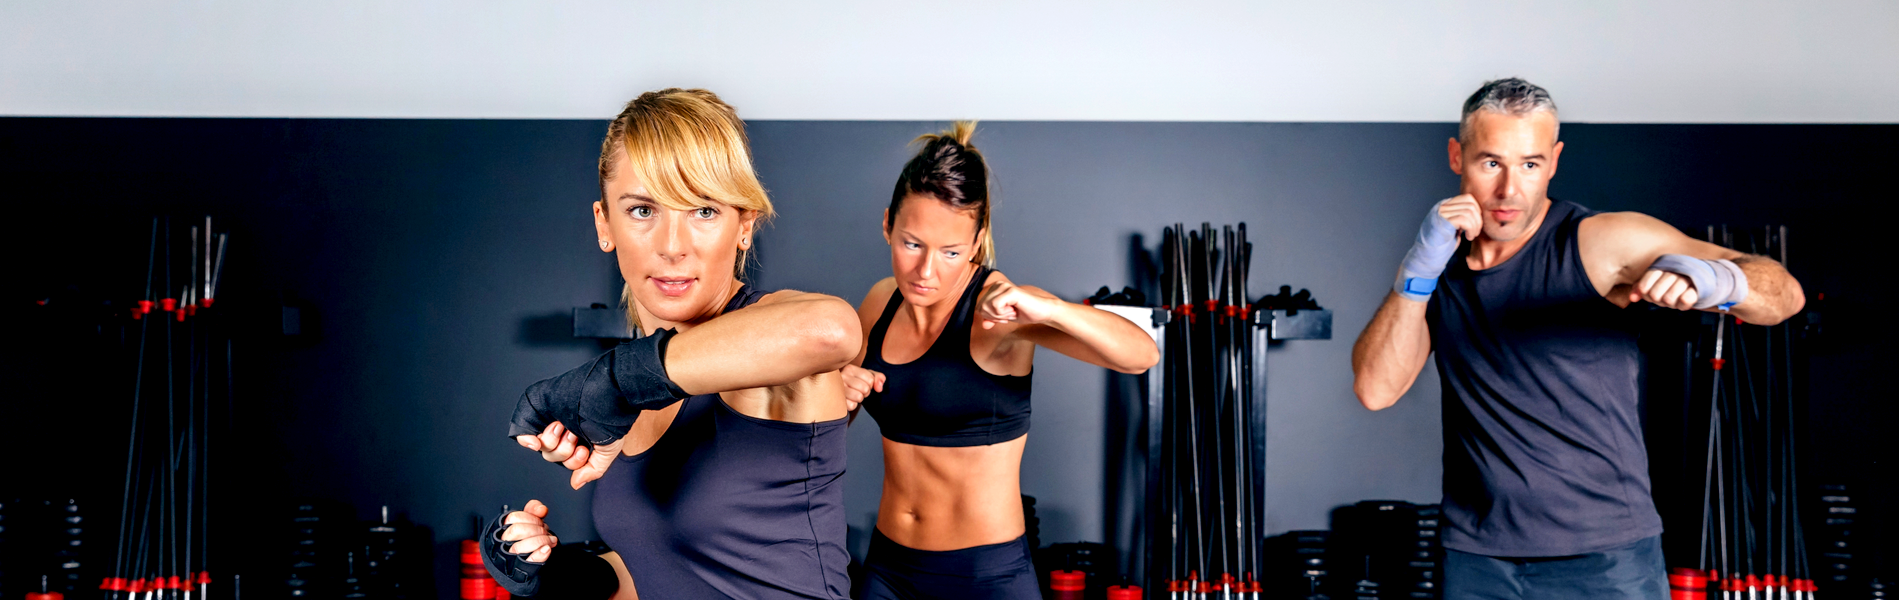 5 Tips on Choosing a Martial Arts Website